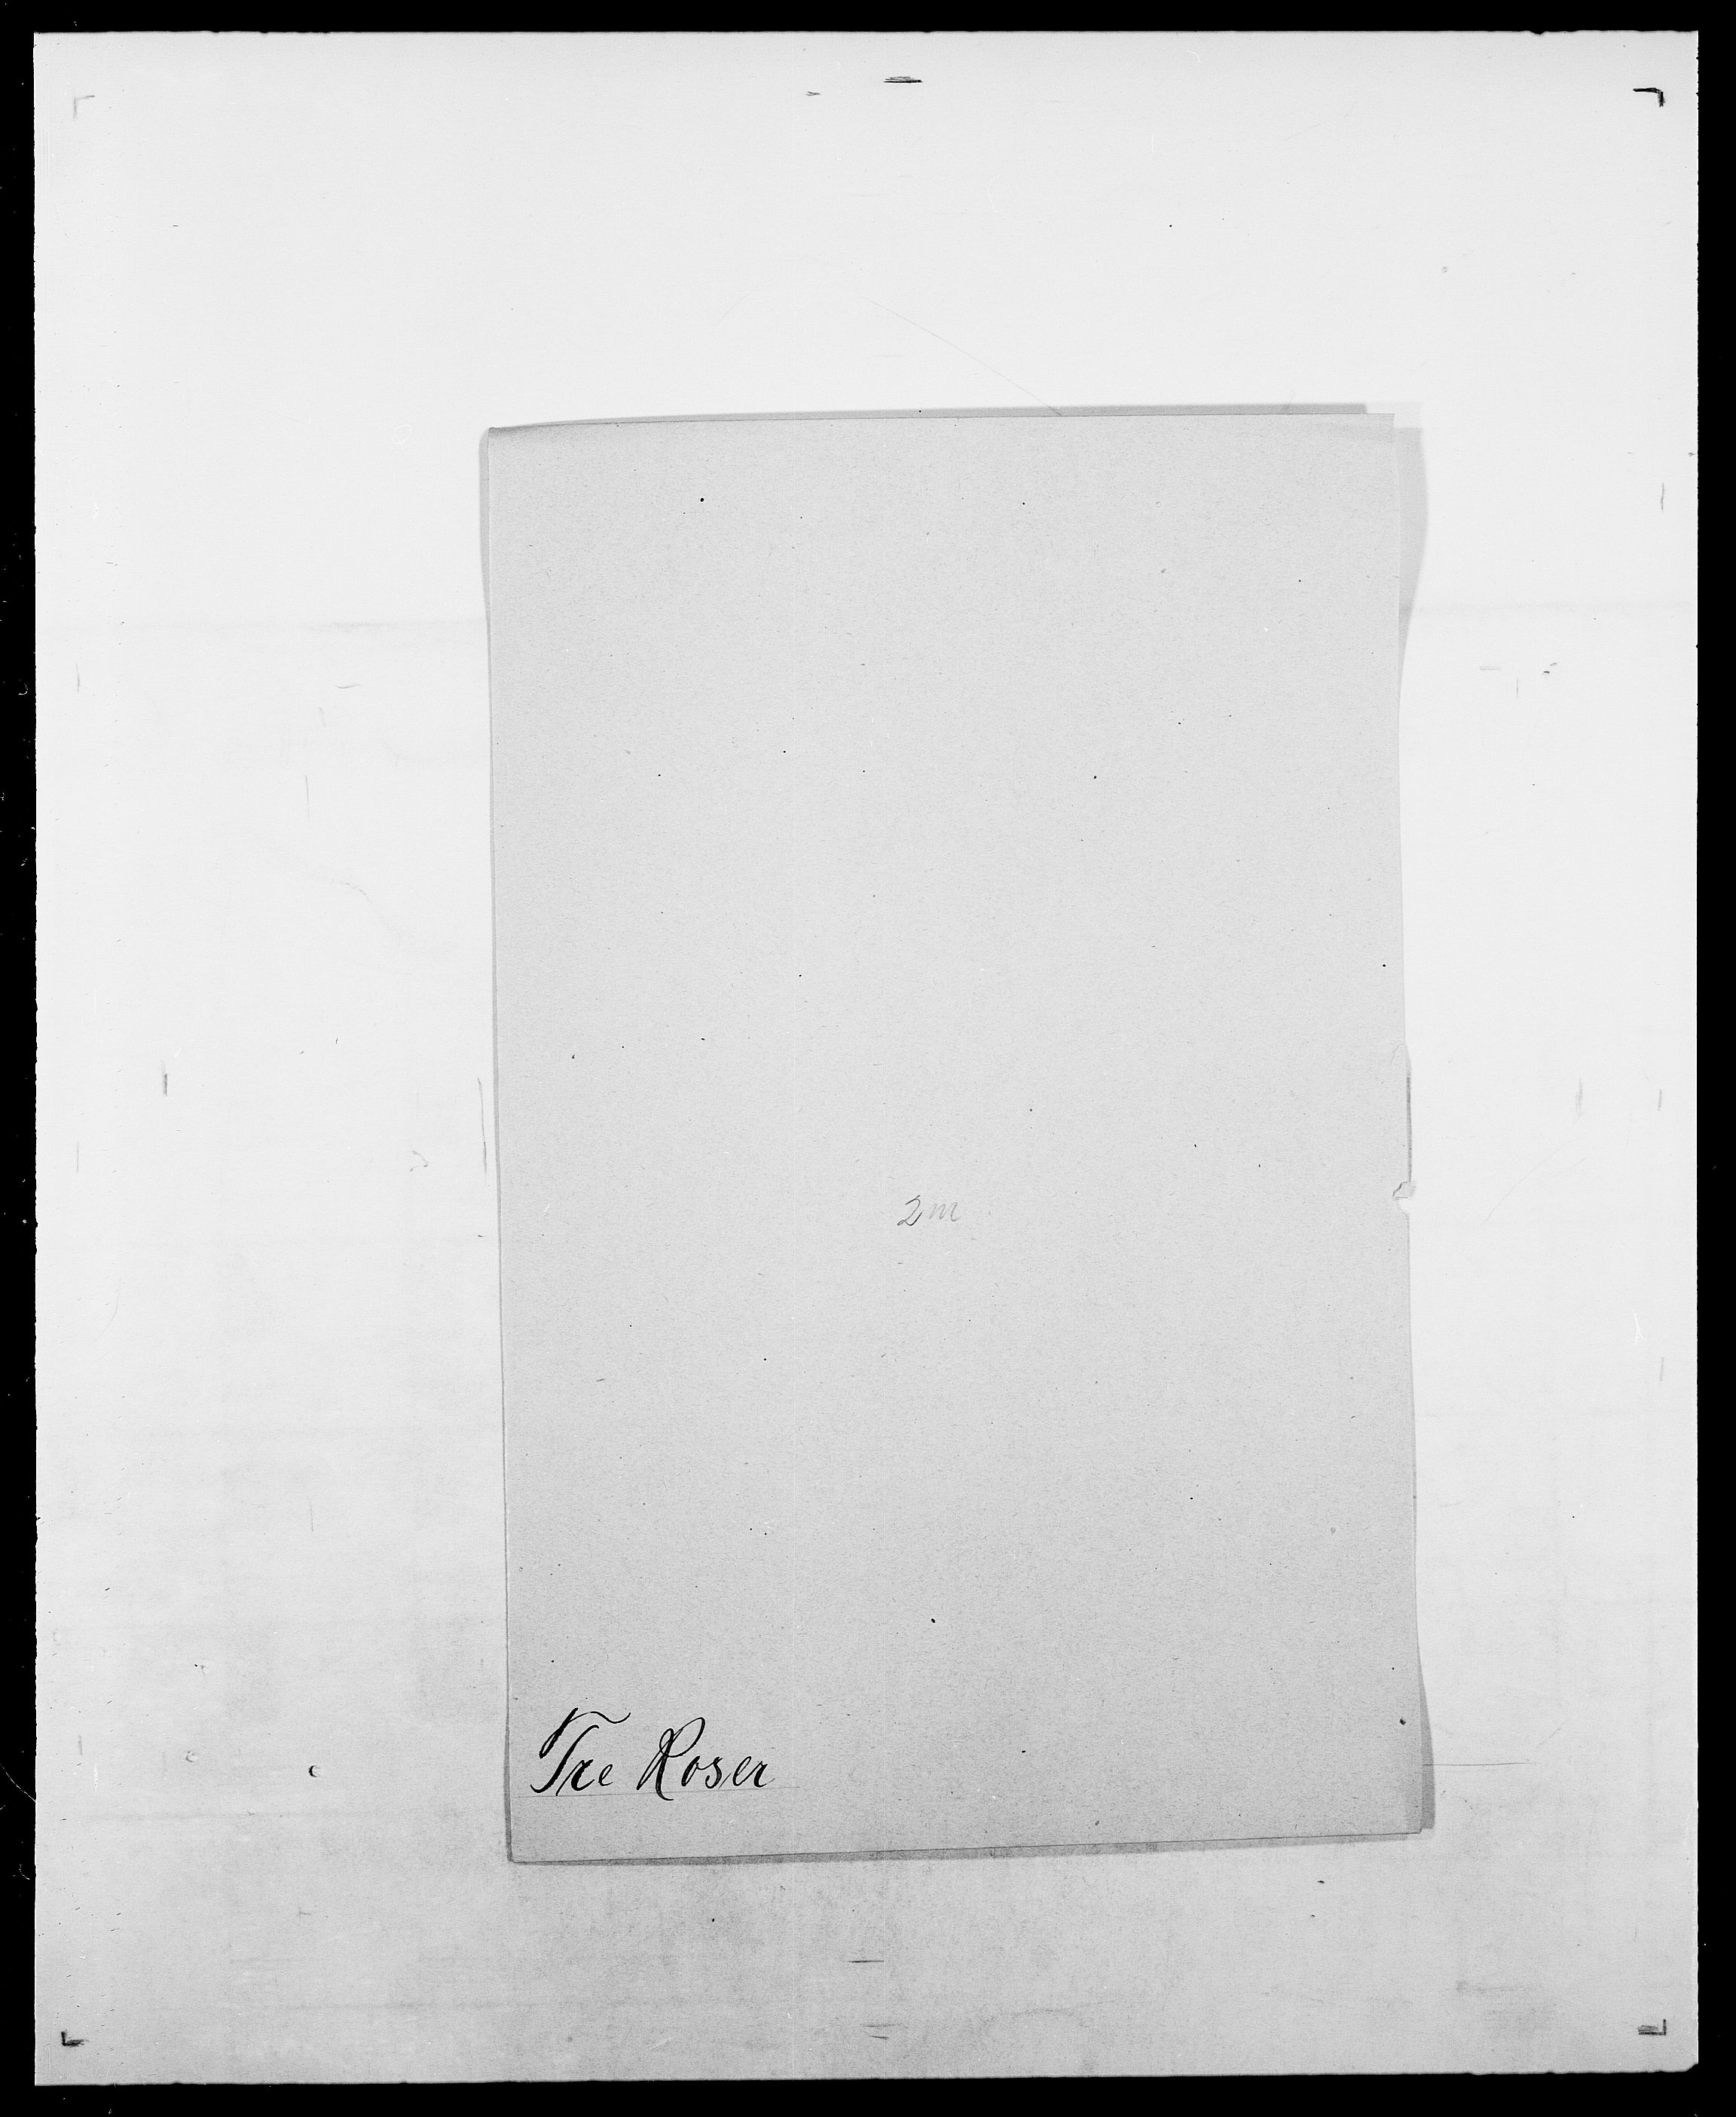 SAO, Delgobe, Charles Antoine - samling, D/Da/L0033: Roald - Røyem, s. 307